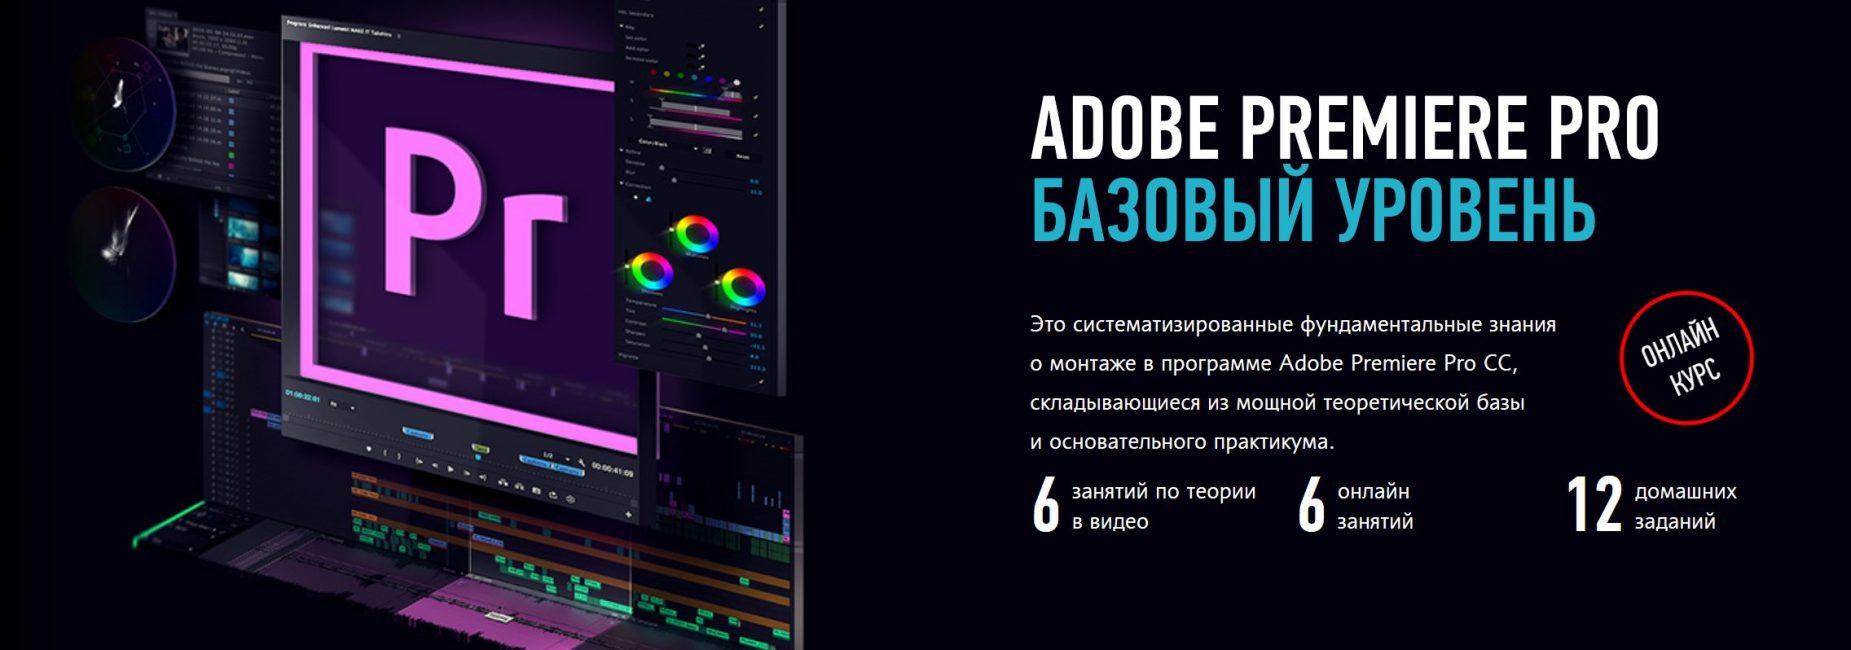 Adobe Premiere Pro. Базовый уровень - Mozilla Firefox